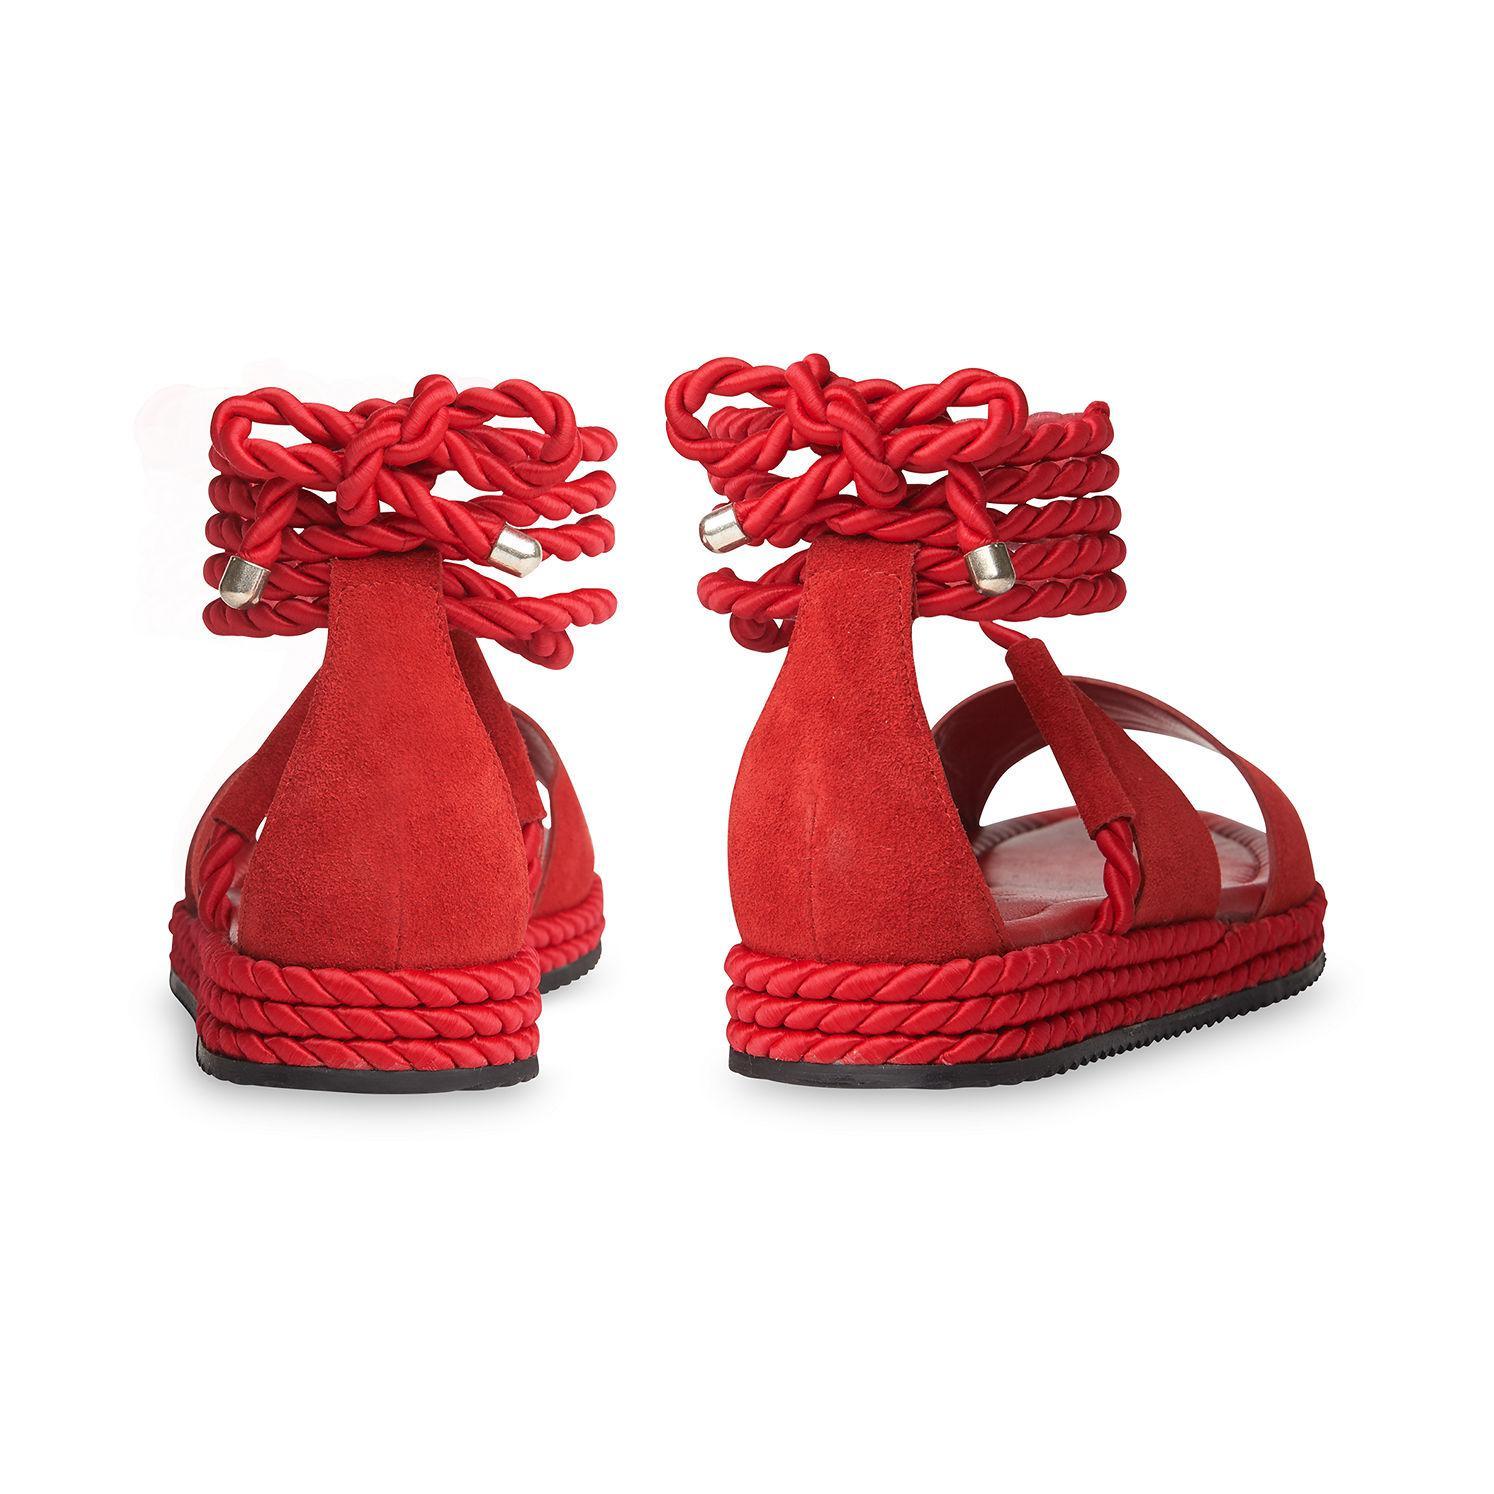 5734d232579a ... Mimosa Rope Flatform Sandals - Lyst. View fullscreen